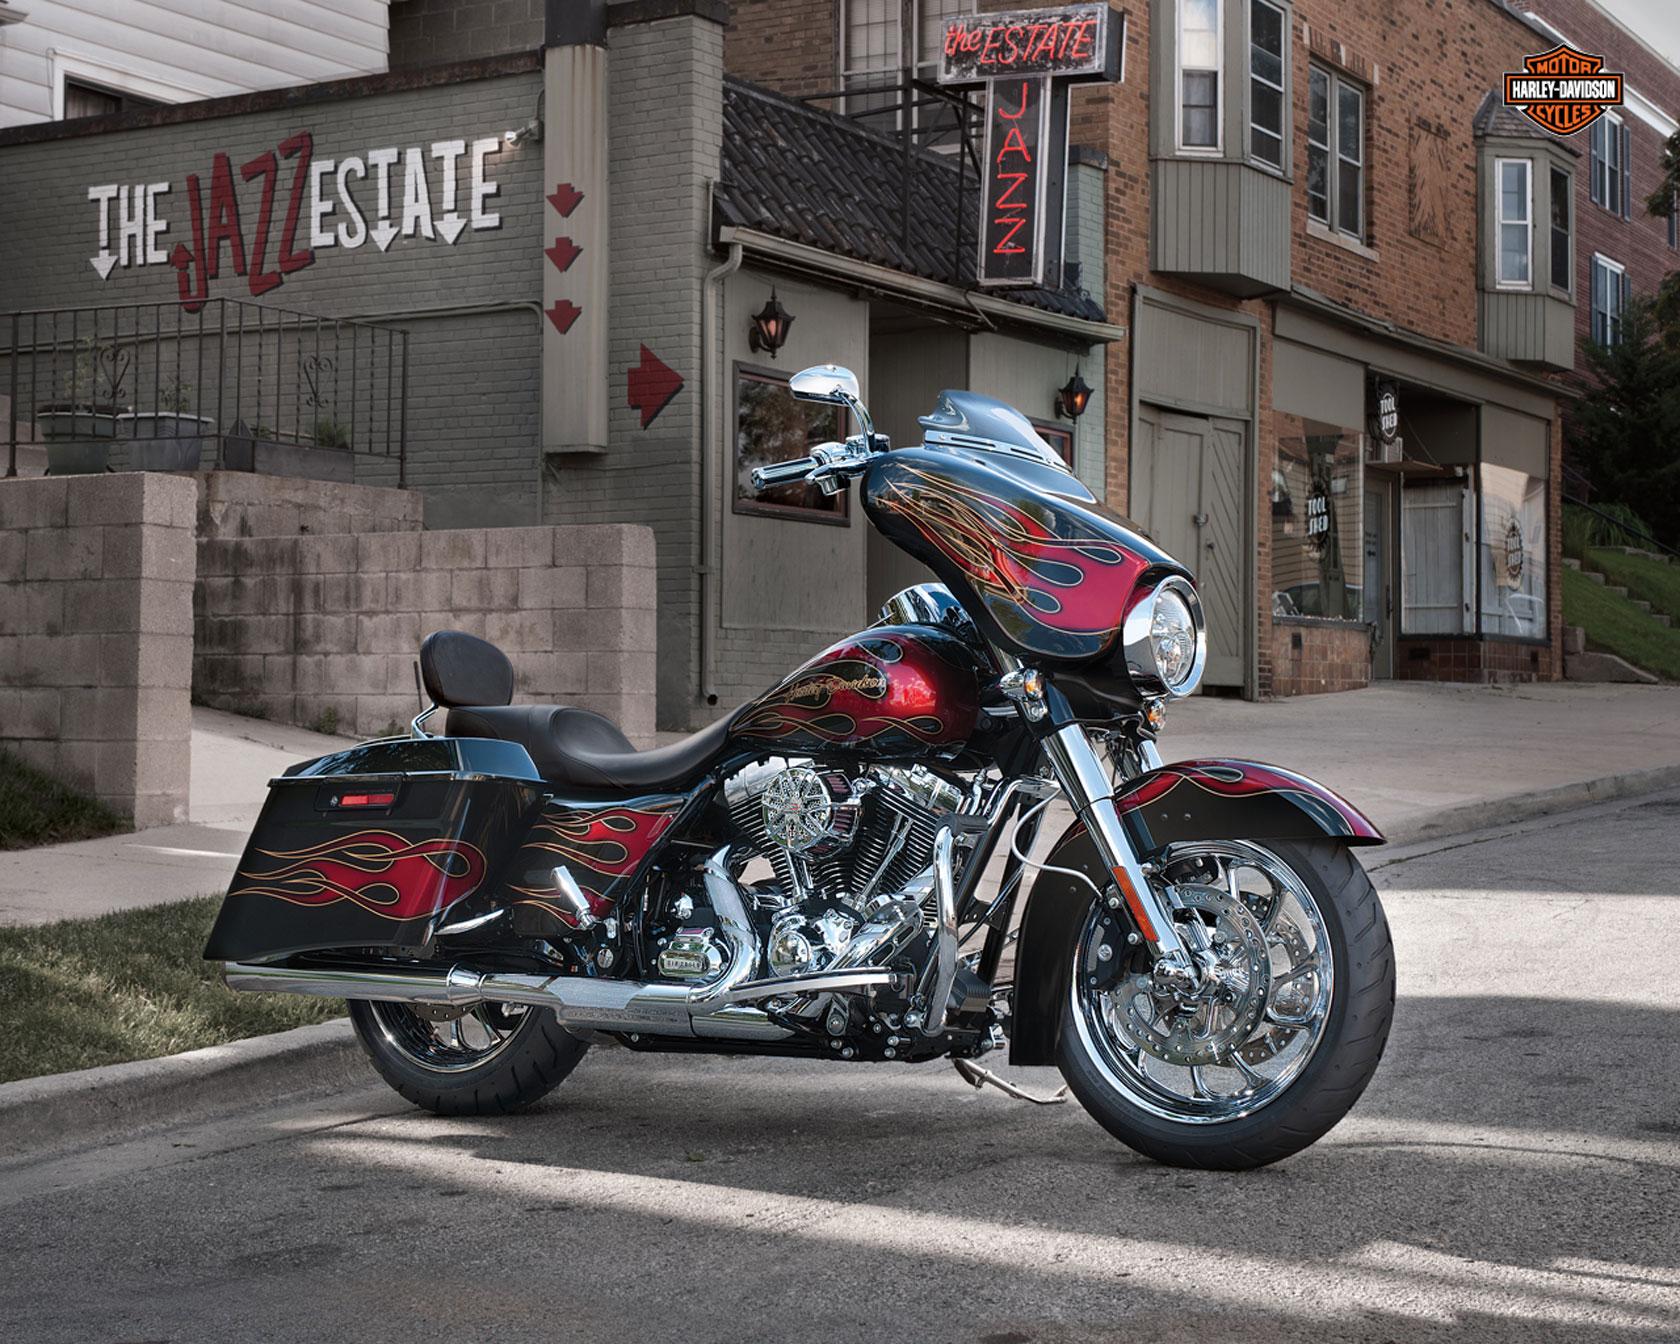 motorcycle harley street glide wallpaper - photo #15